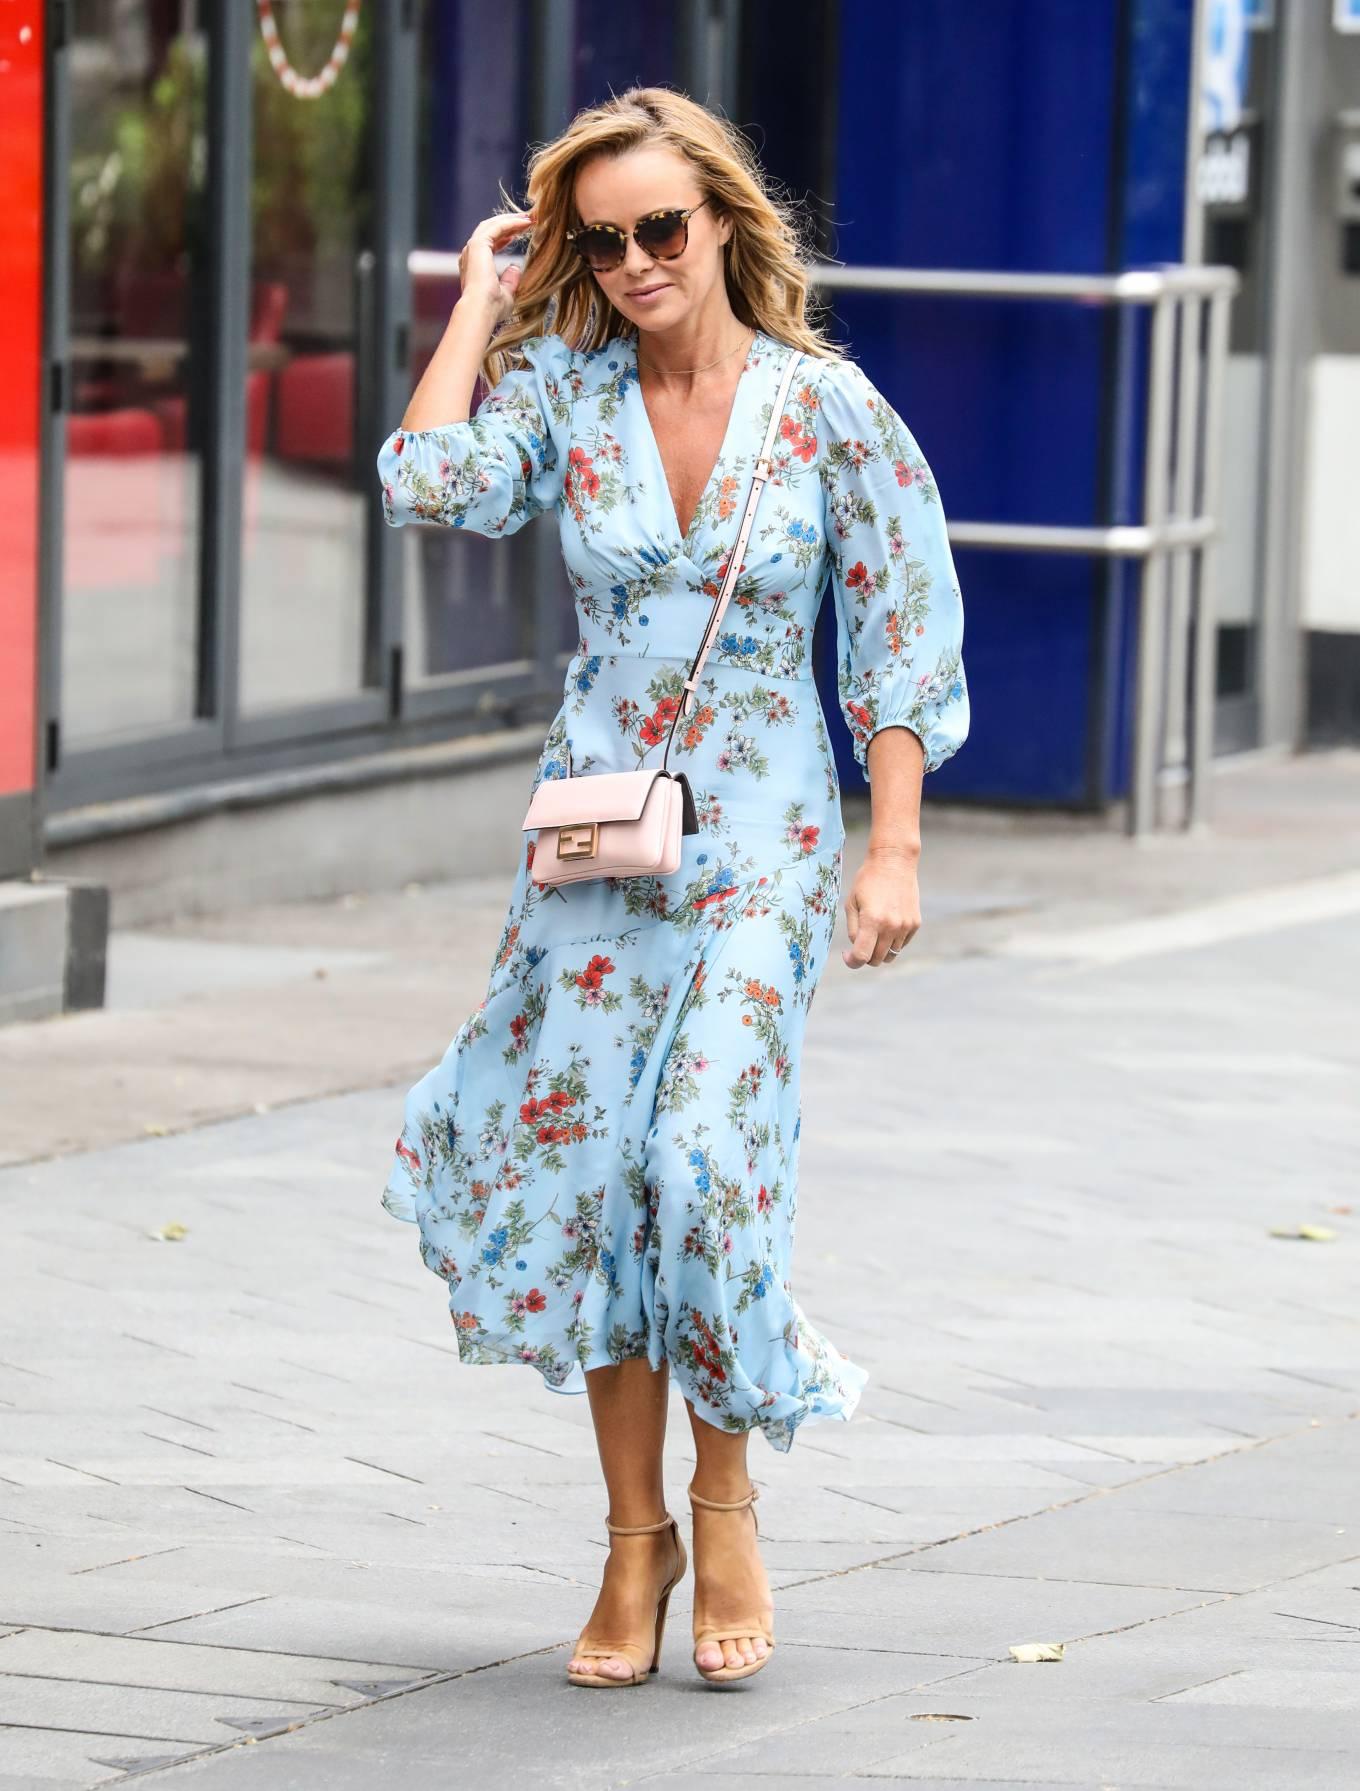 Amanda Holden - Wearing a flower print dress while leaving the Global Radio Studios in London